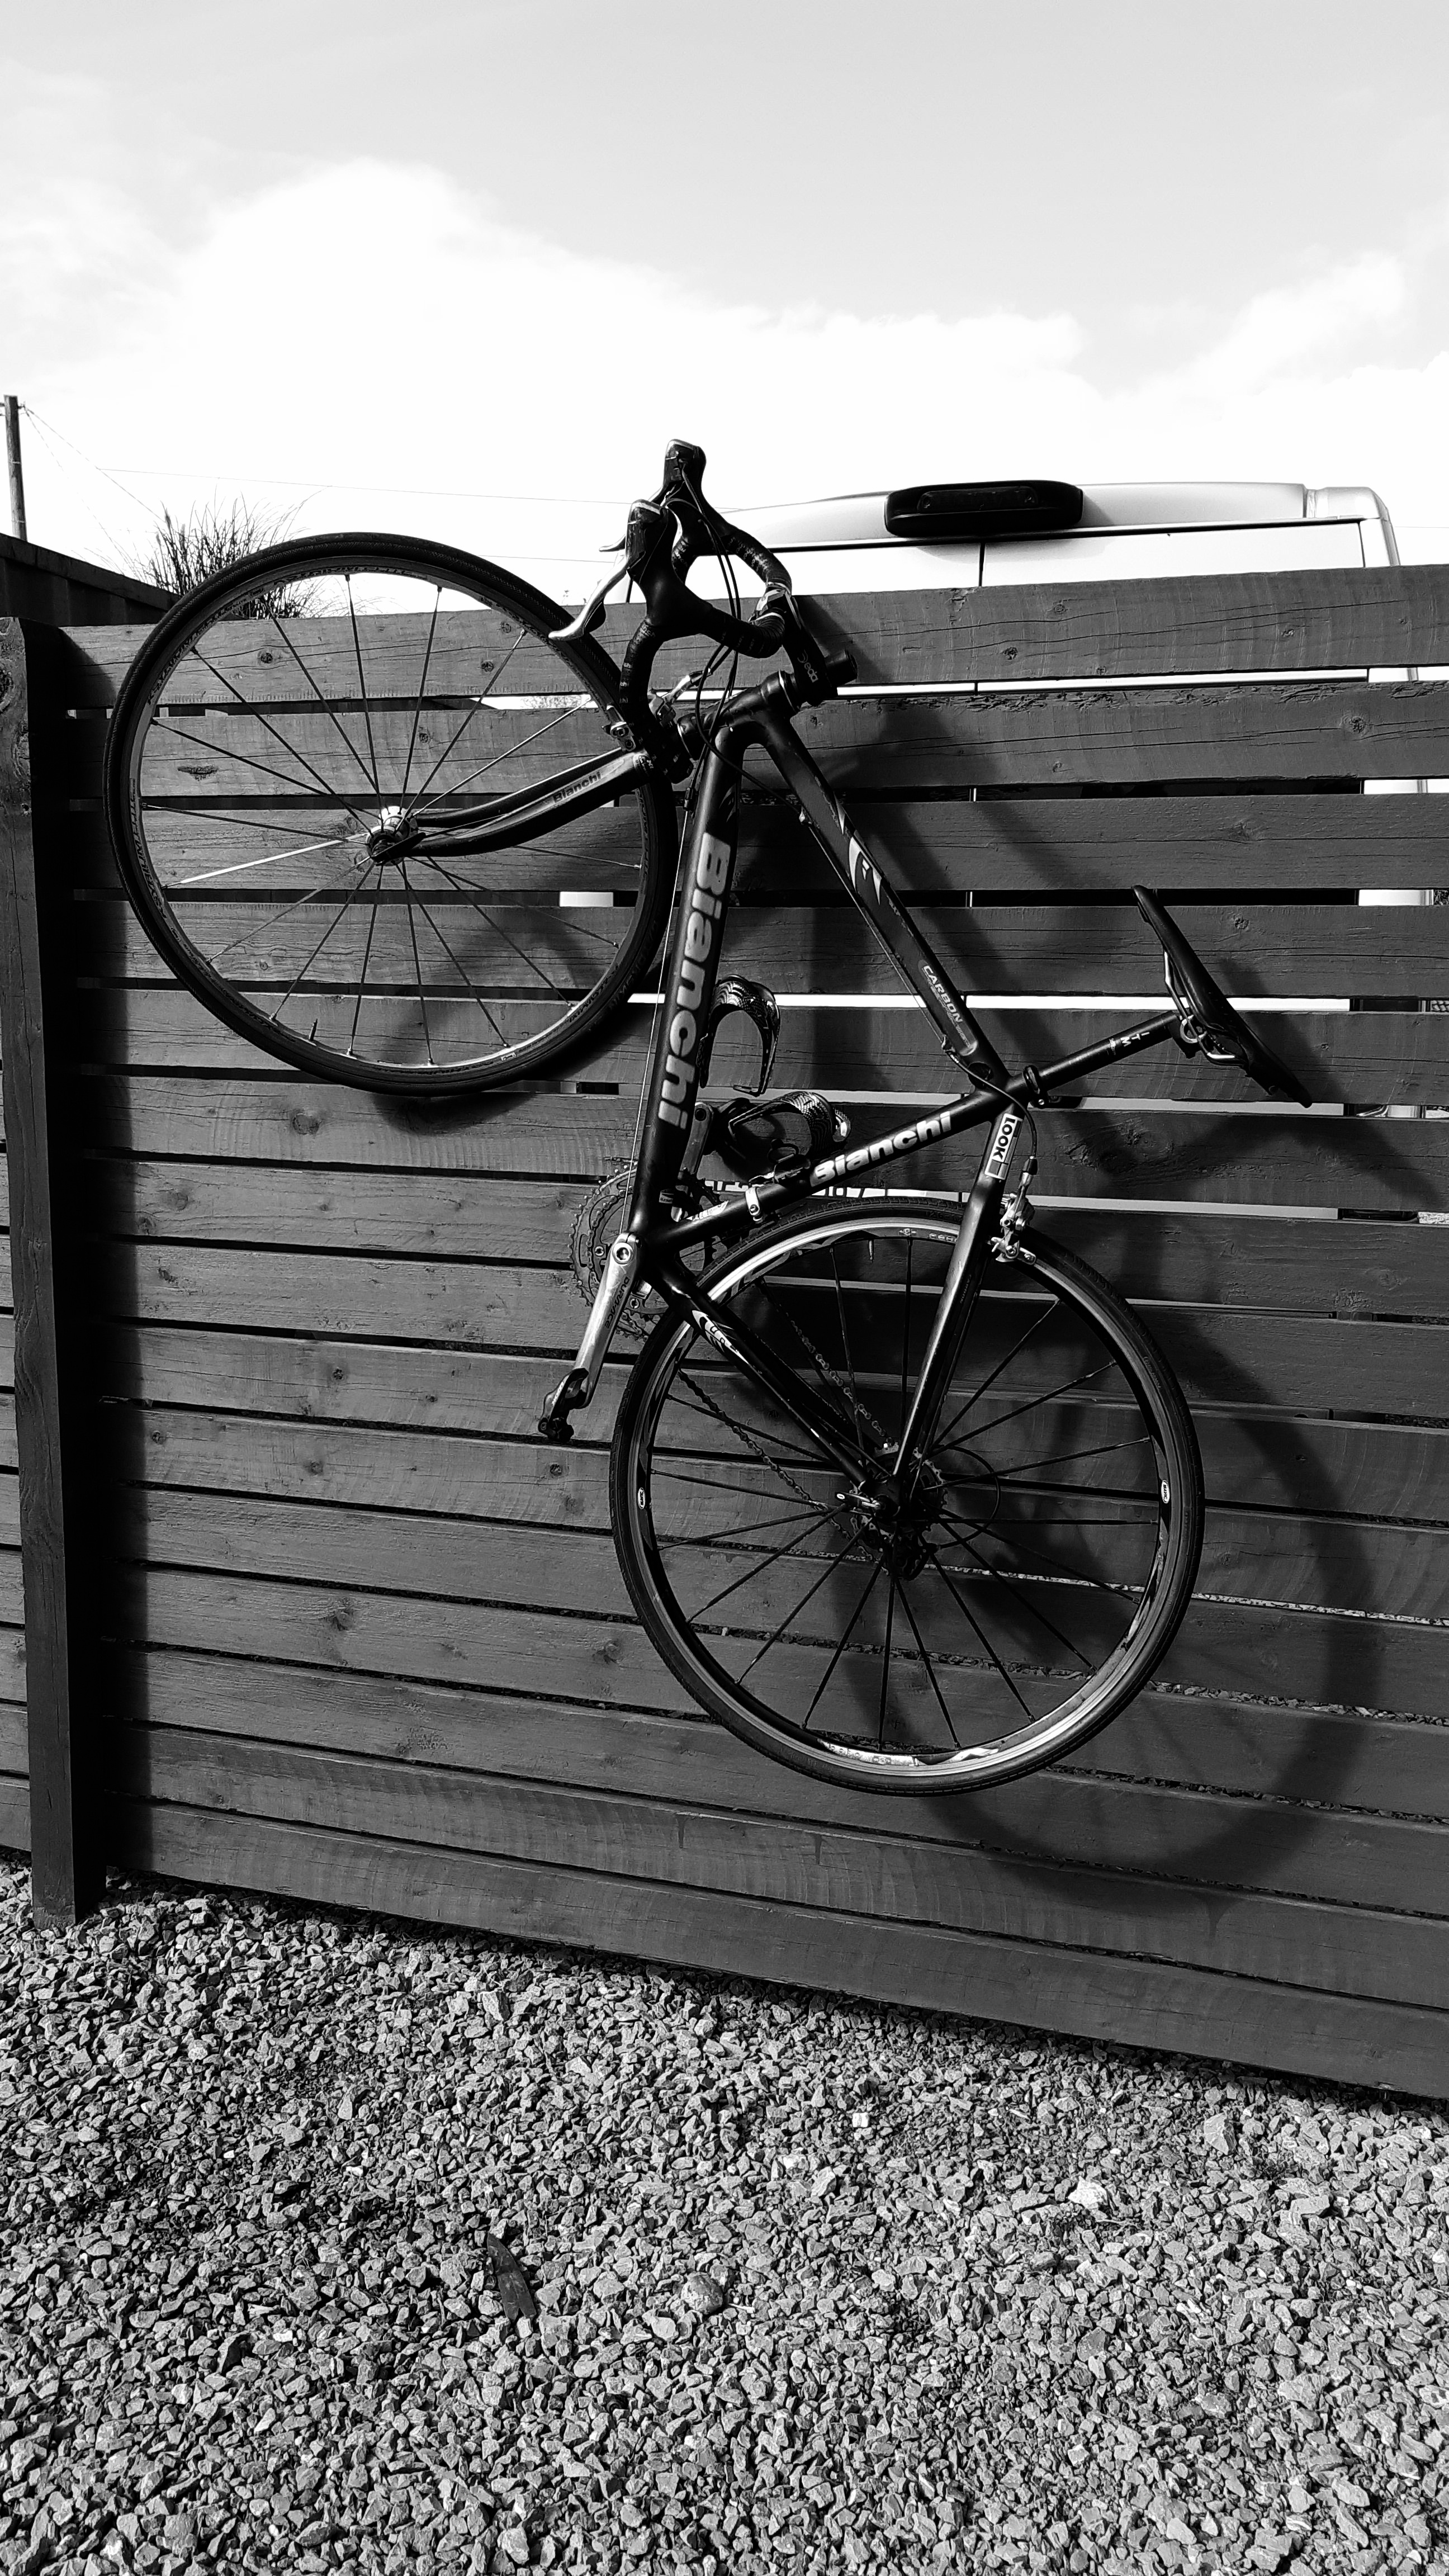 Bianchi Racing Bicycle